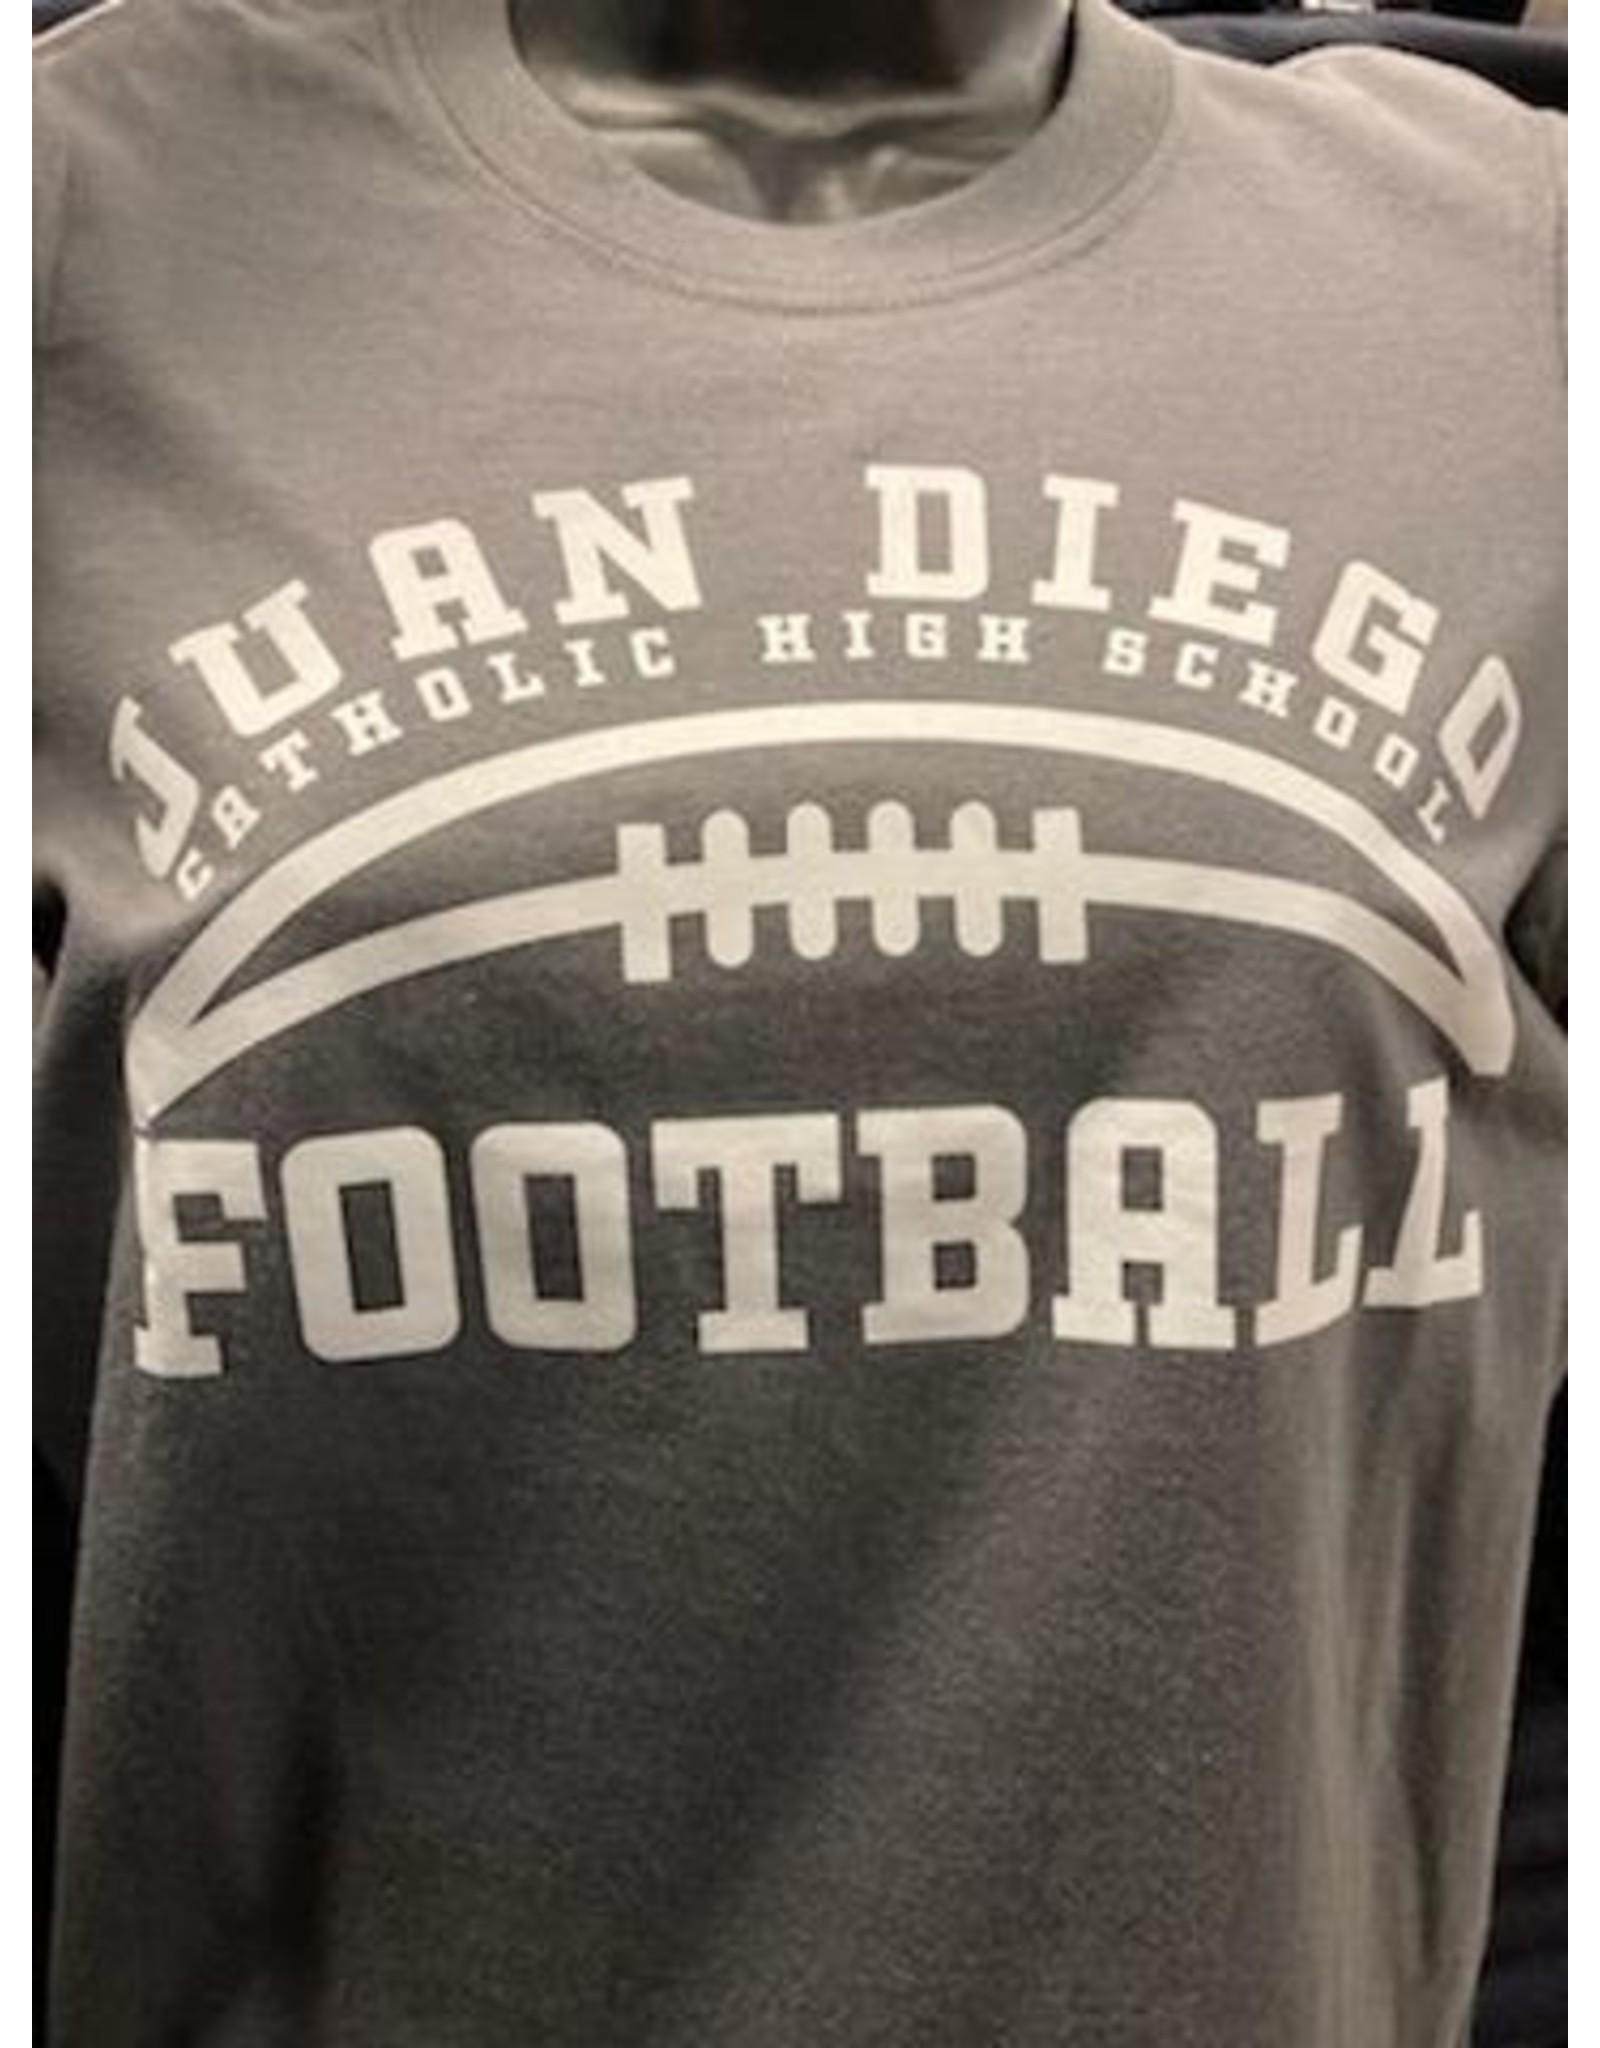 NON-UNIFORM FOOTBALL SHIRT - Ladies Fit or Unisex Style T-Shirt